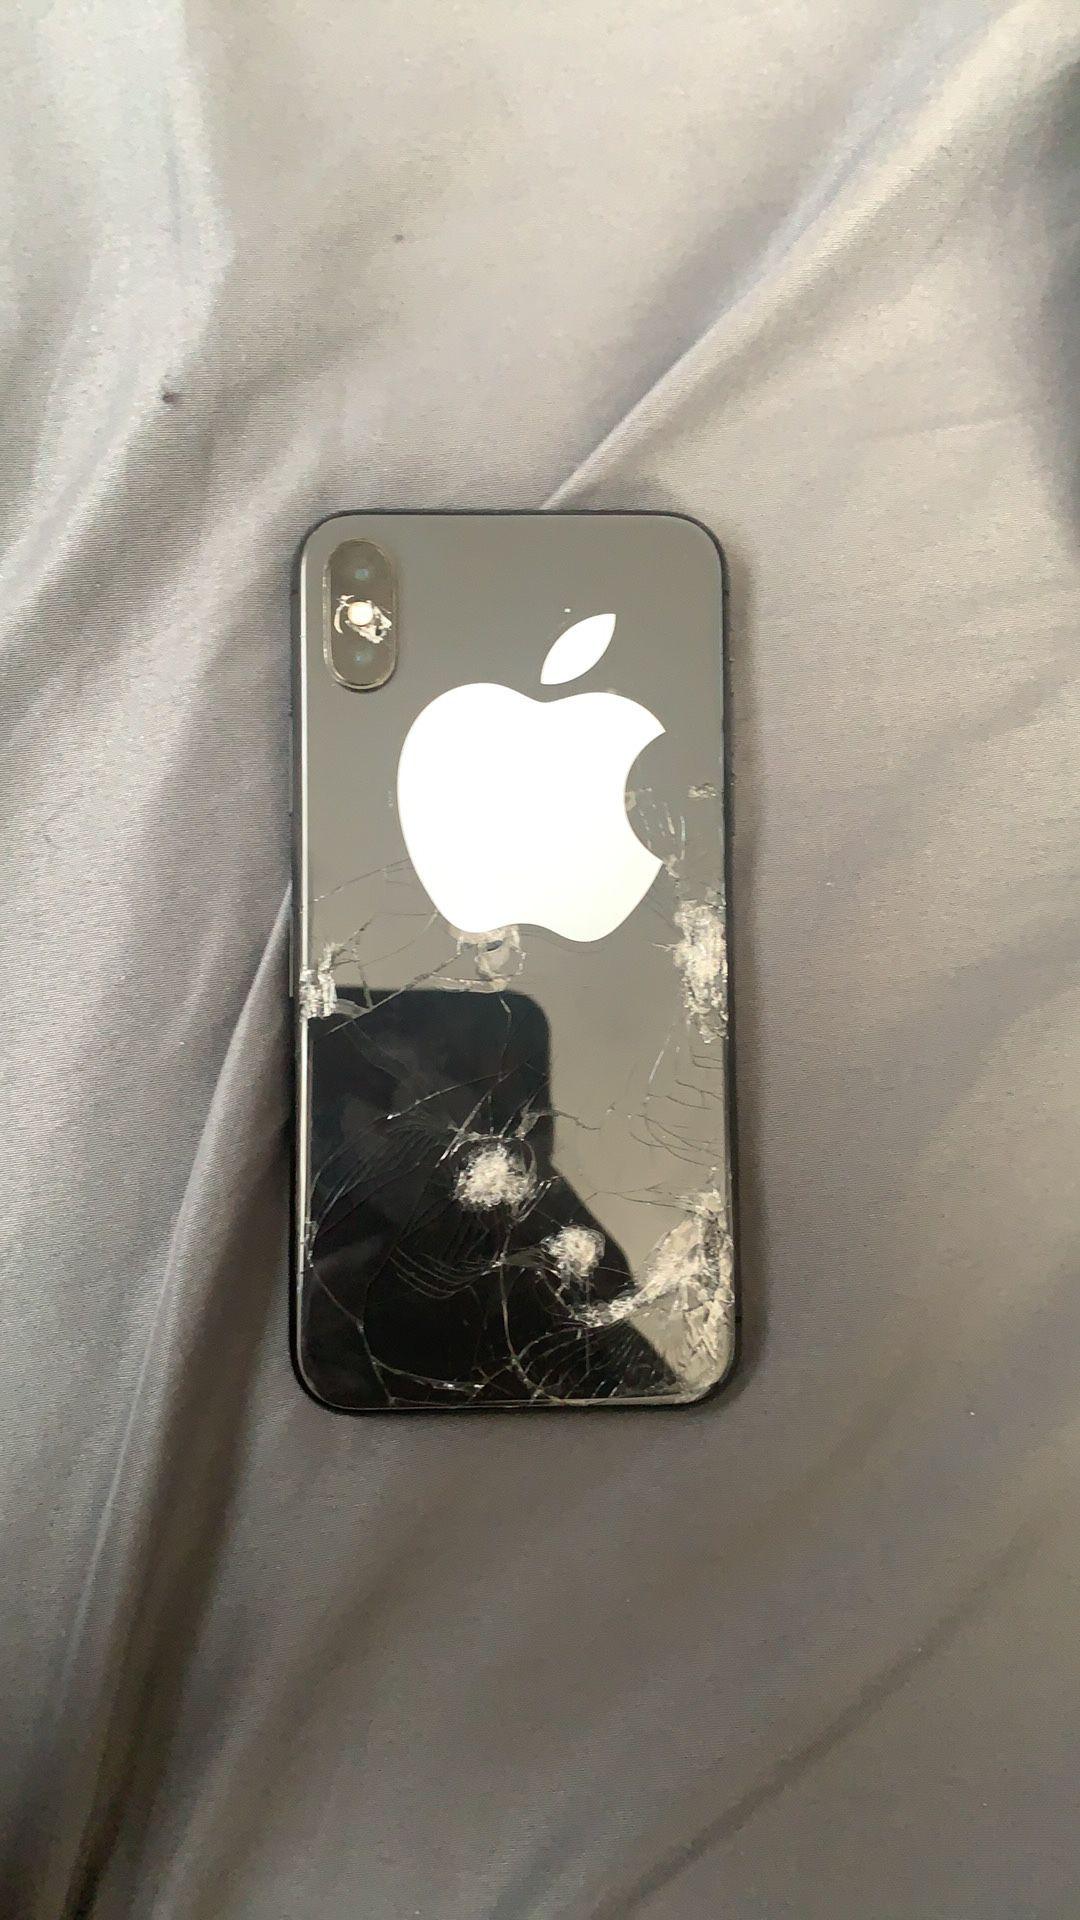 Locked iphone x